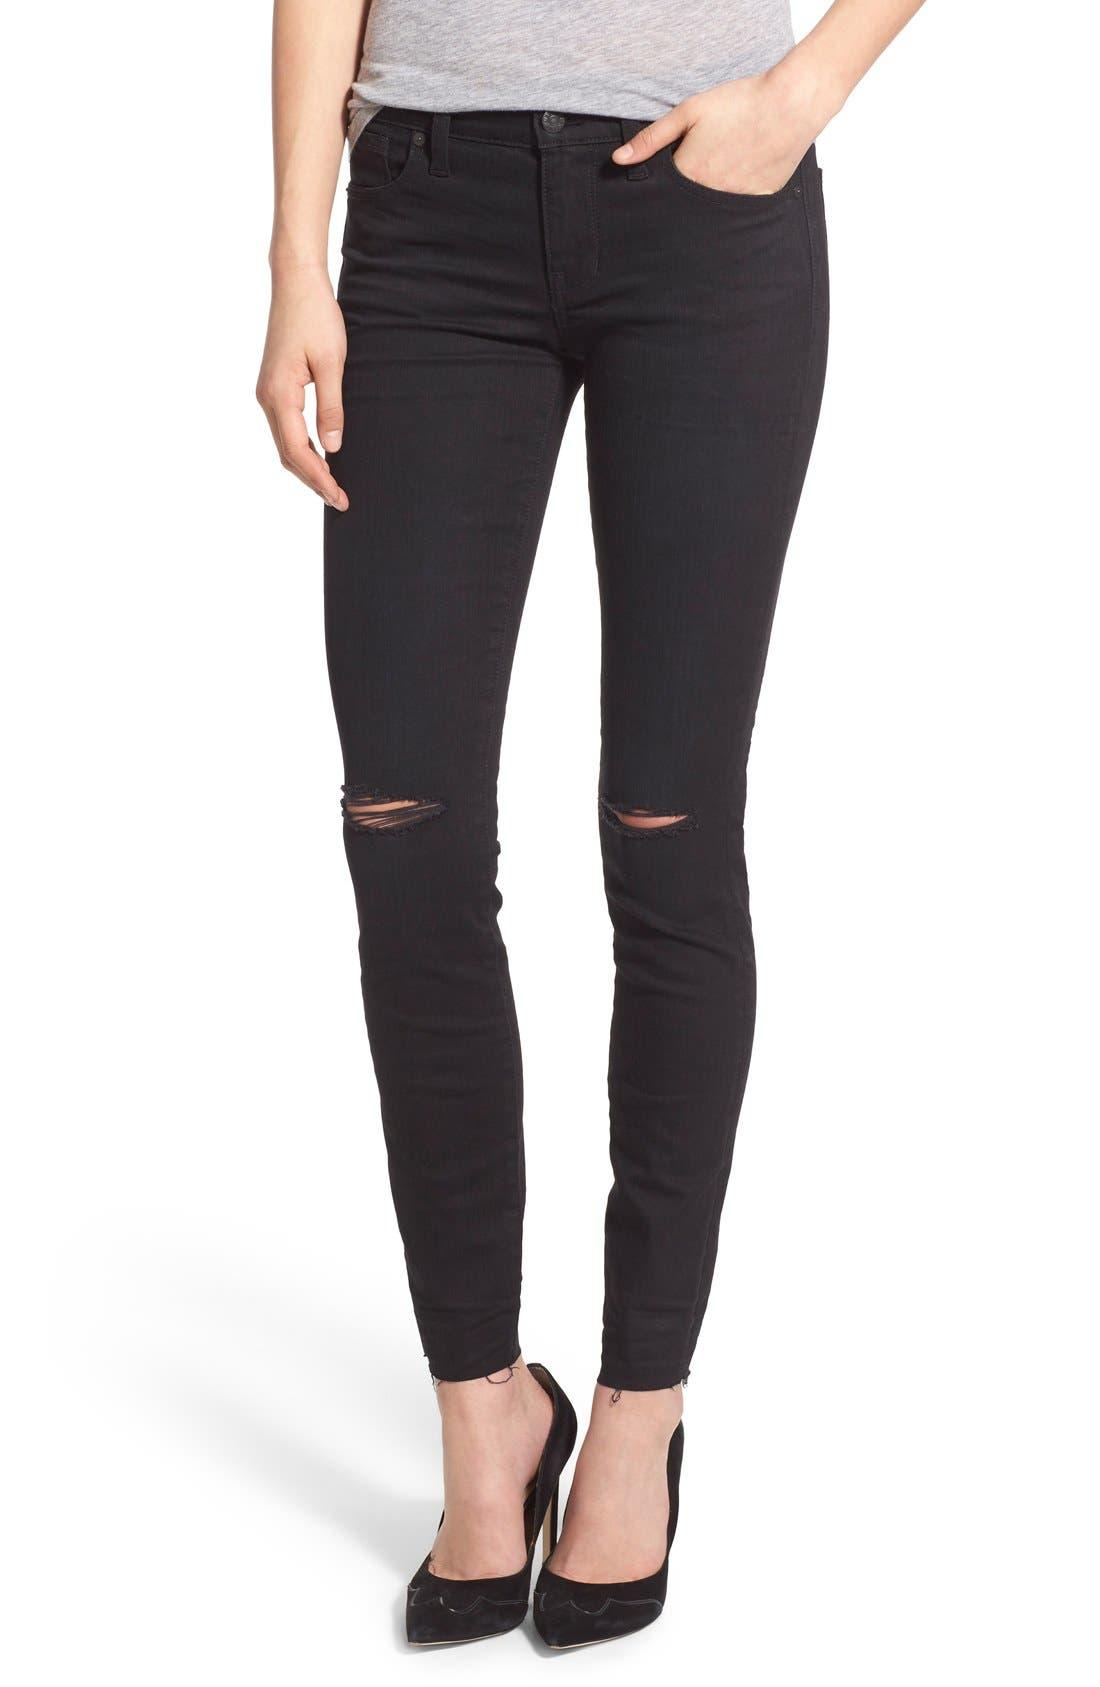 Alternate Image 1 Selected - Madewell 'Skinny Skinny' Knee Rip Jeans (Trent Wash) (Long)